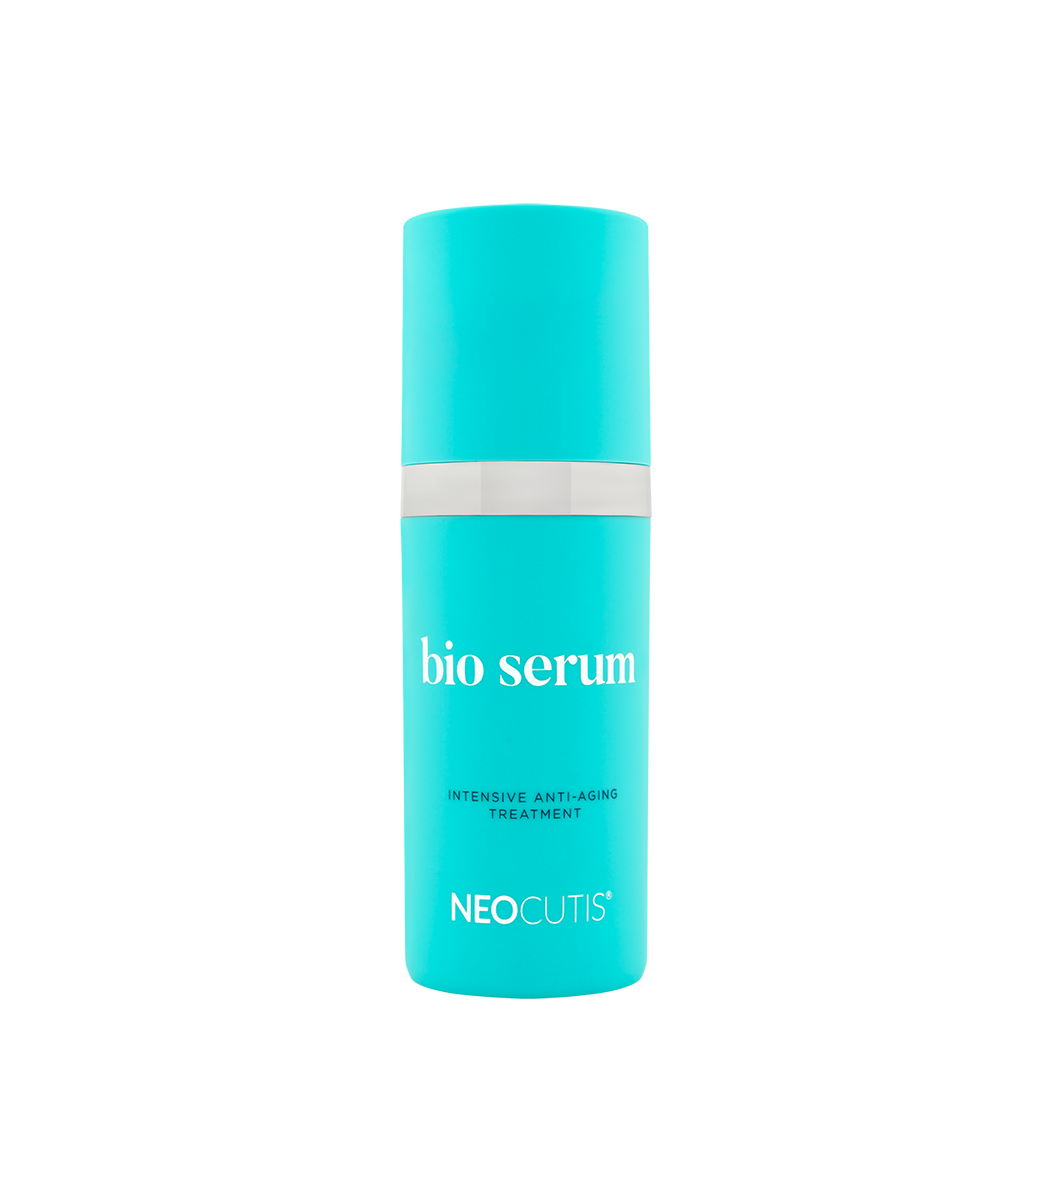 BIO SERUM: Anti-Aging Treatments | Reduce Fine Lines & Wrinkles